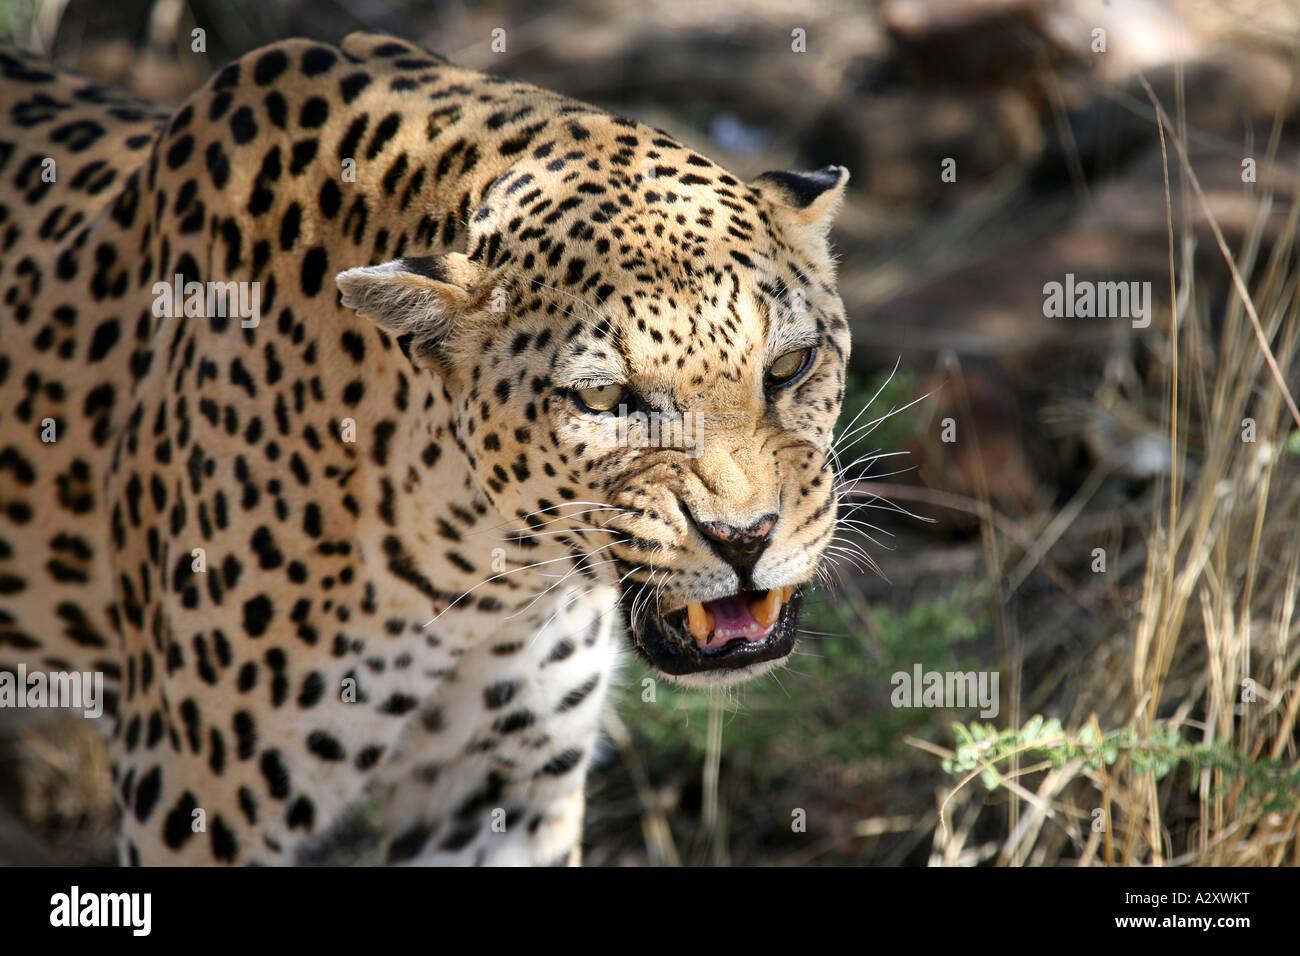 Leopard Big Cat, Namibia Stock Photo